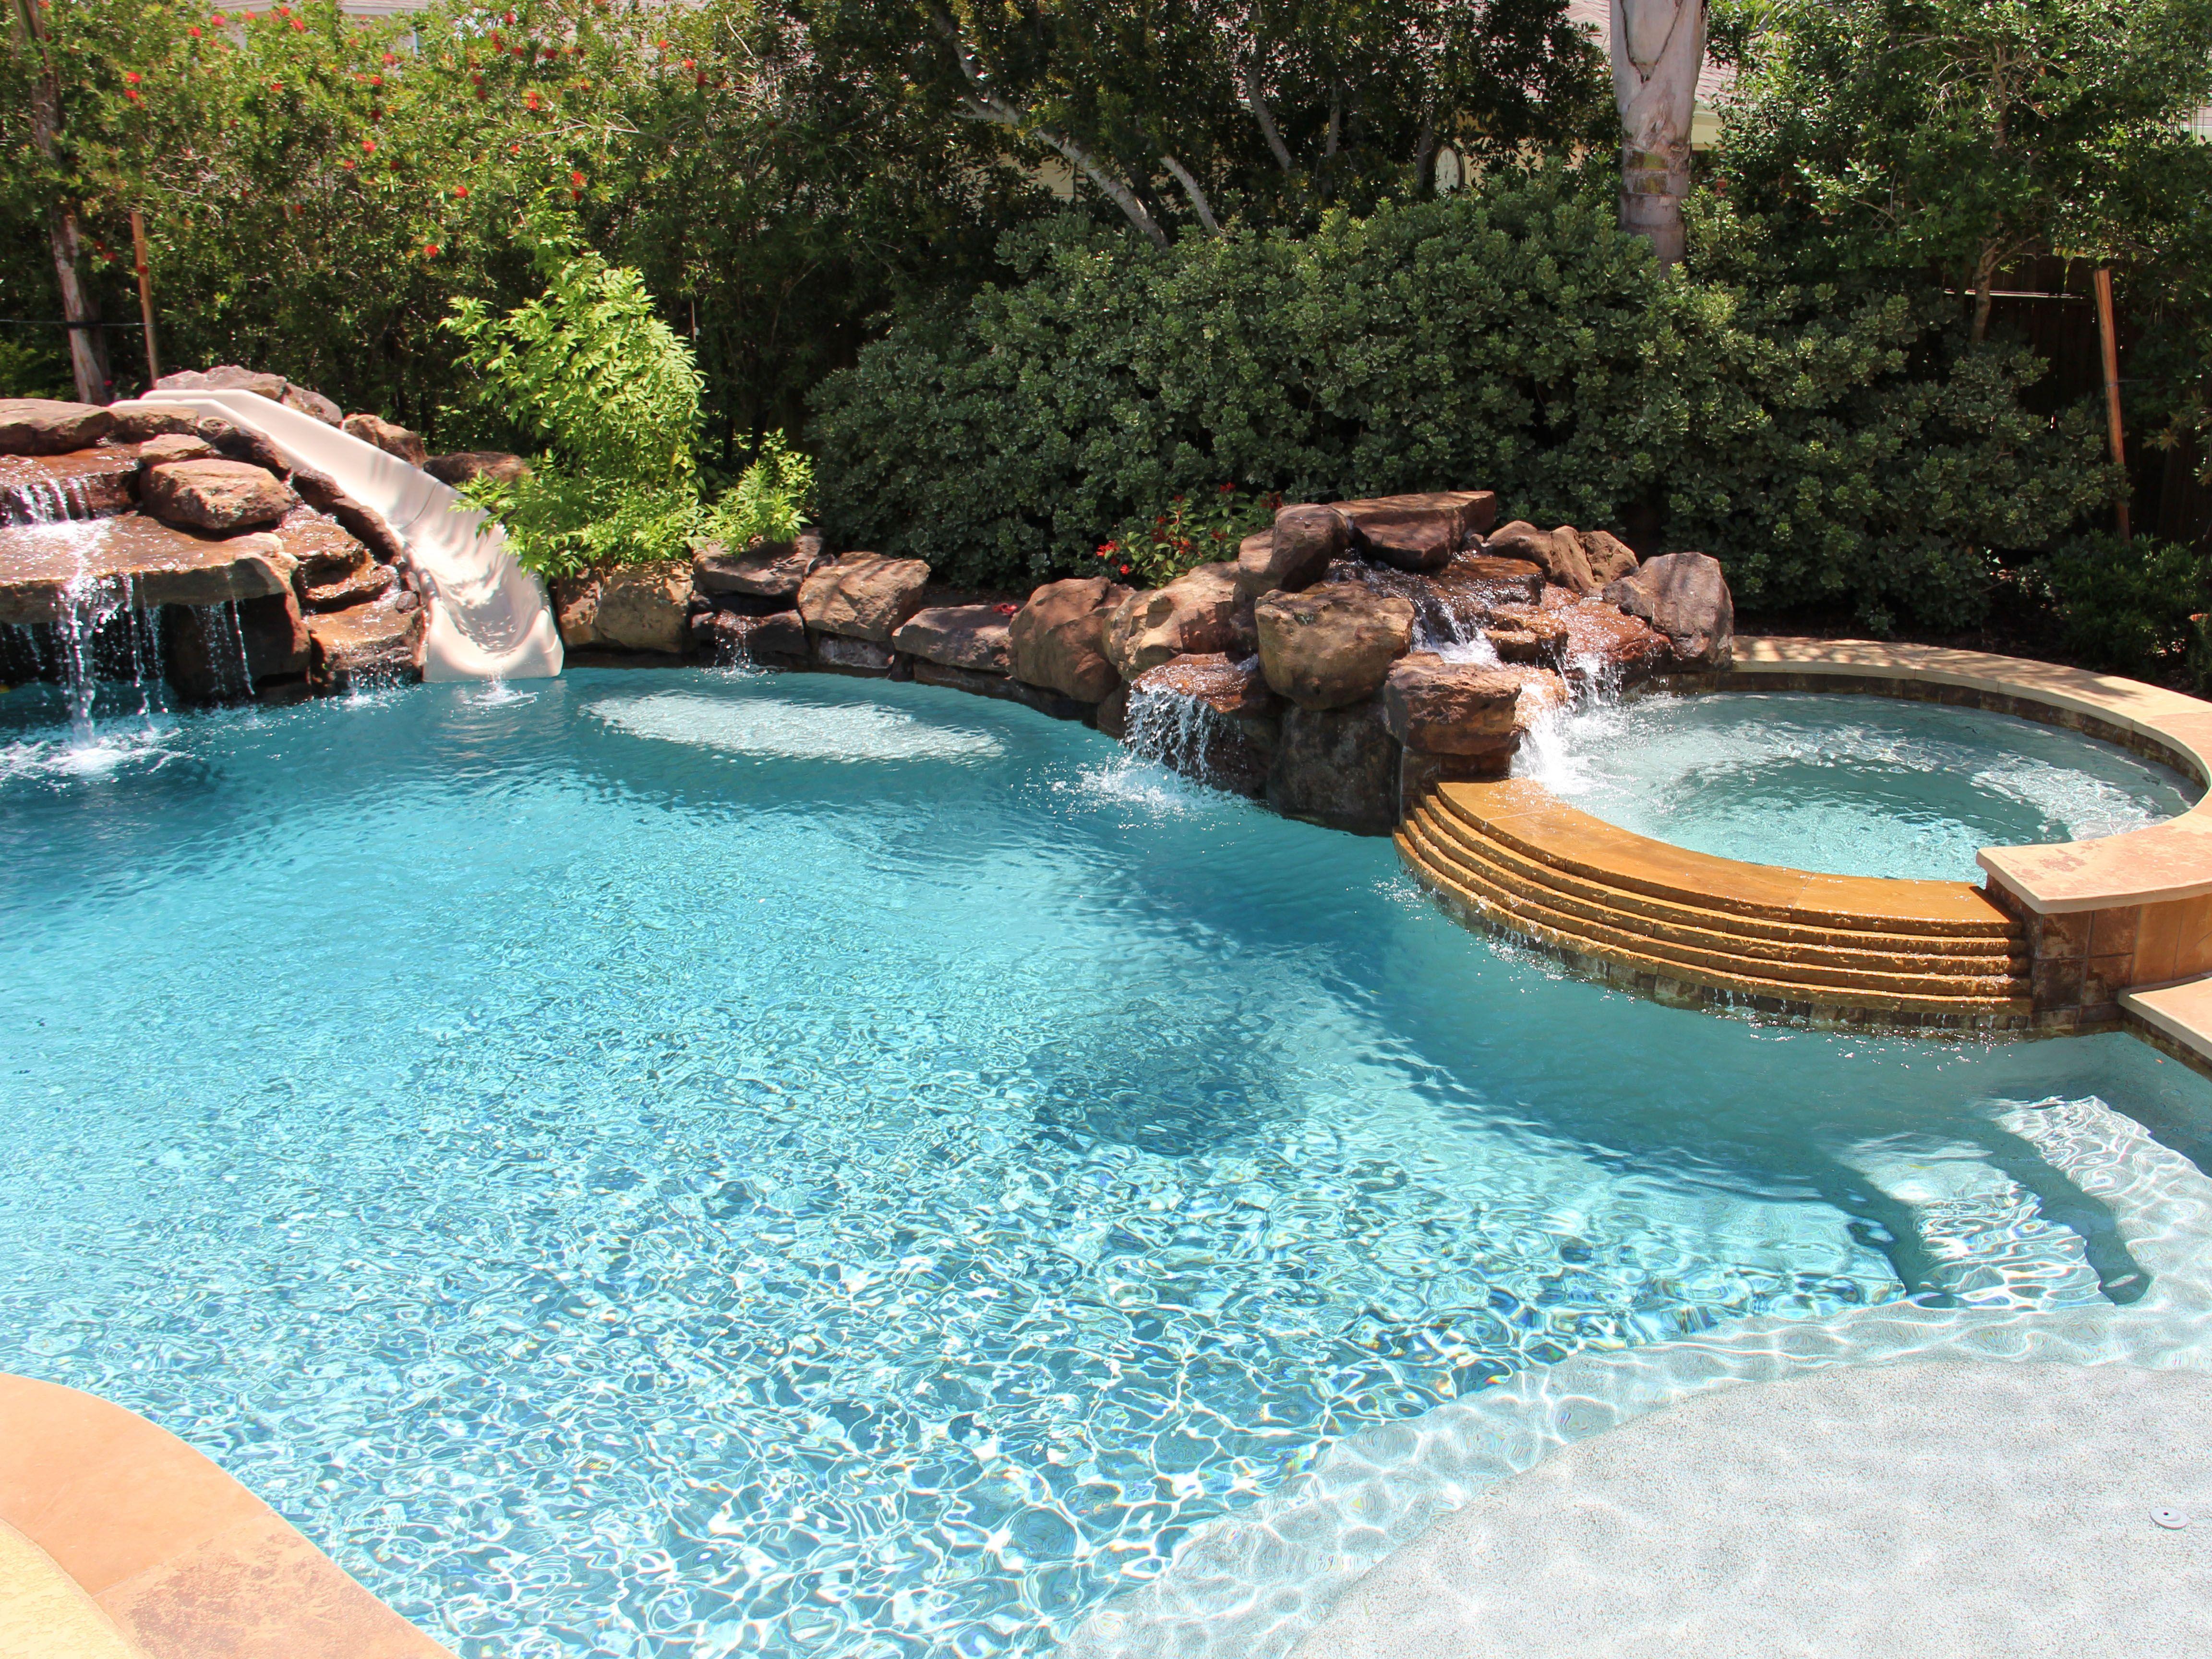 Free Form Swimming Pool Designs Natural Free Form Swimming Pools Design 267  Backyard & Front